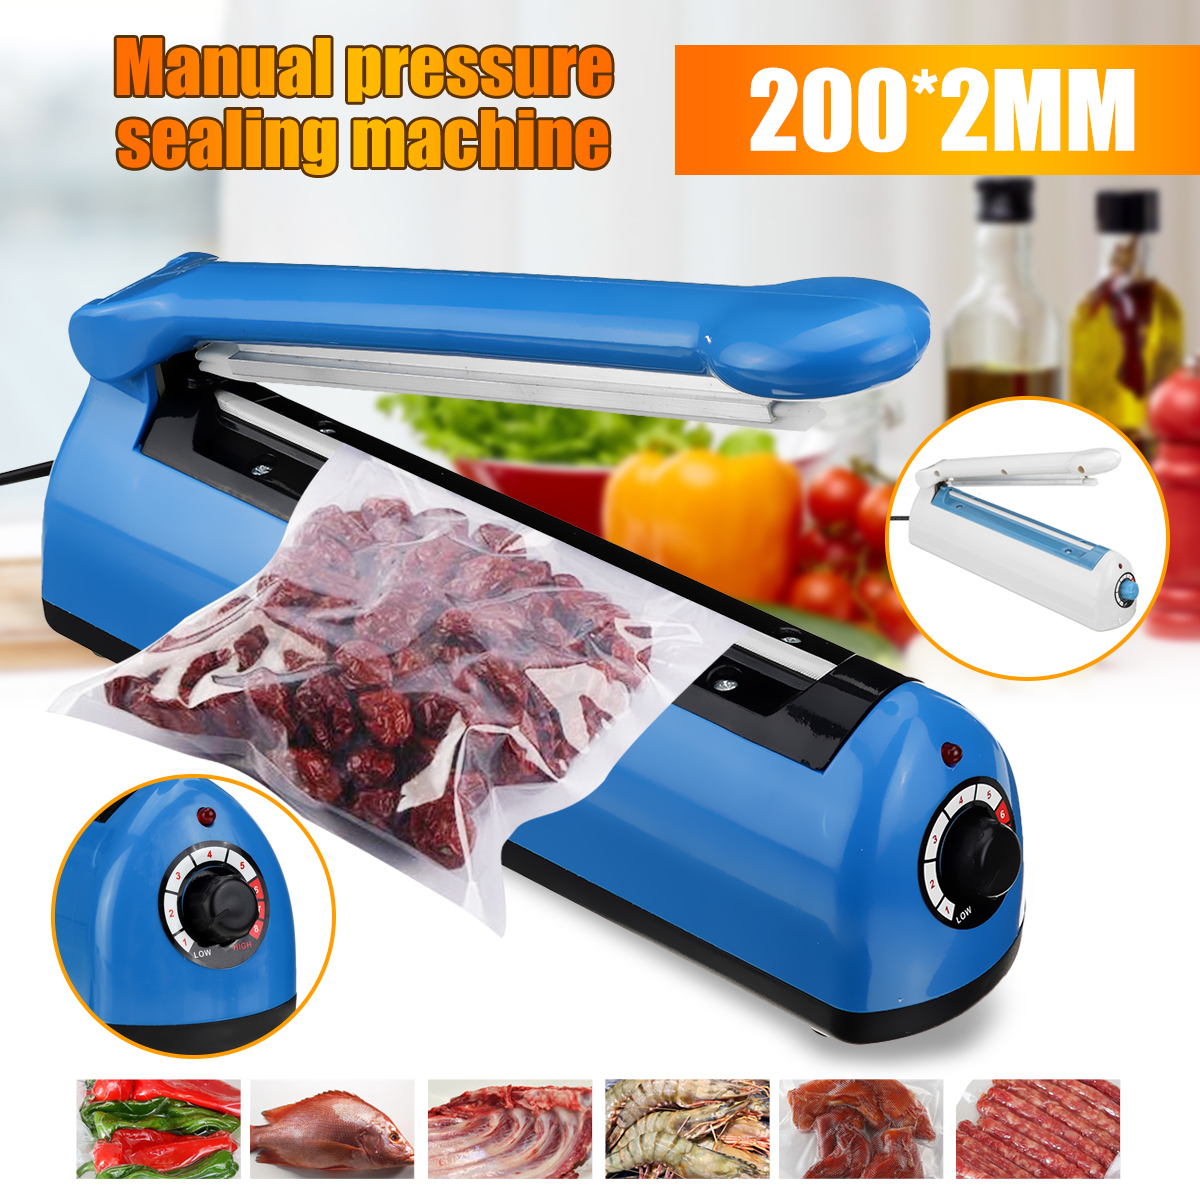 230mm 300W Pulse Power Sealer Heat Sealing Machine Kitchen Food Sealer Vacuum Bag Sealer Plastic Bag Packing Tools US EU Plug